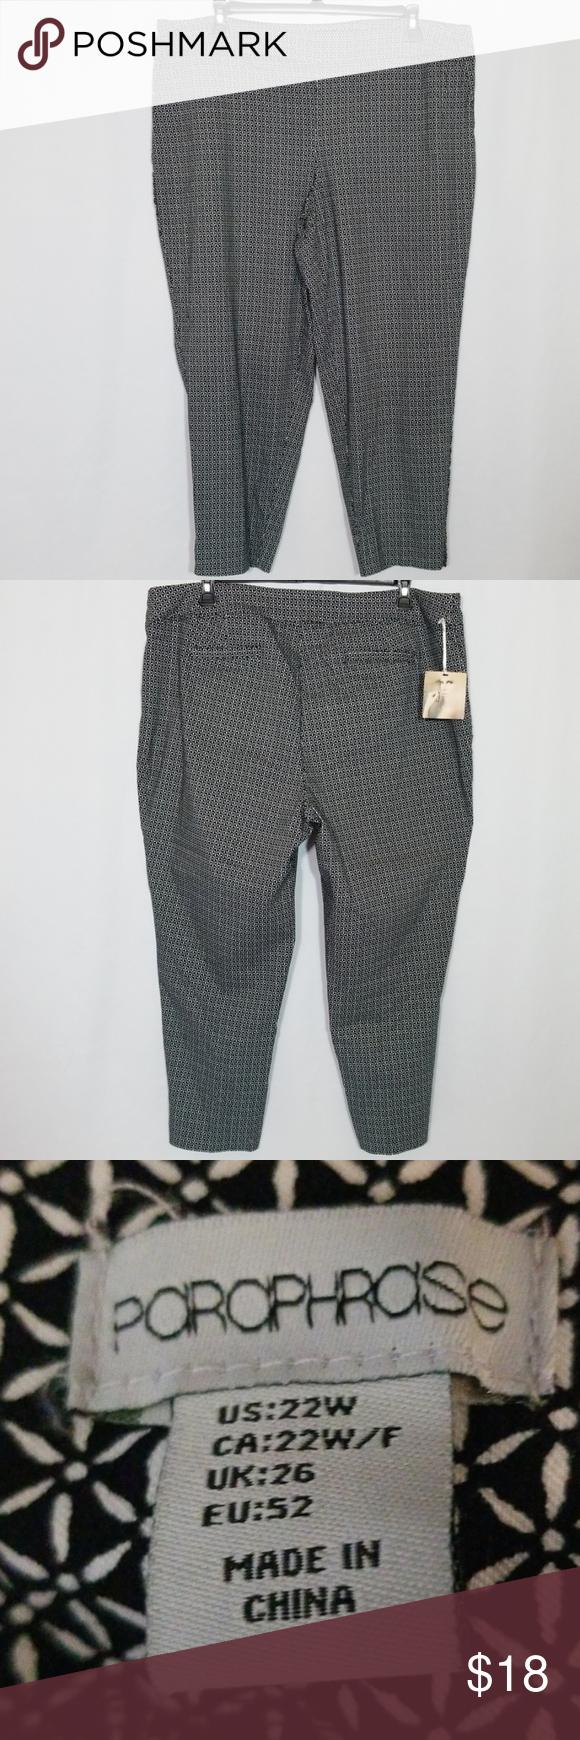 Nwt Paraphrase Career Dres Pant Size 22 W Pants